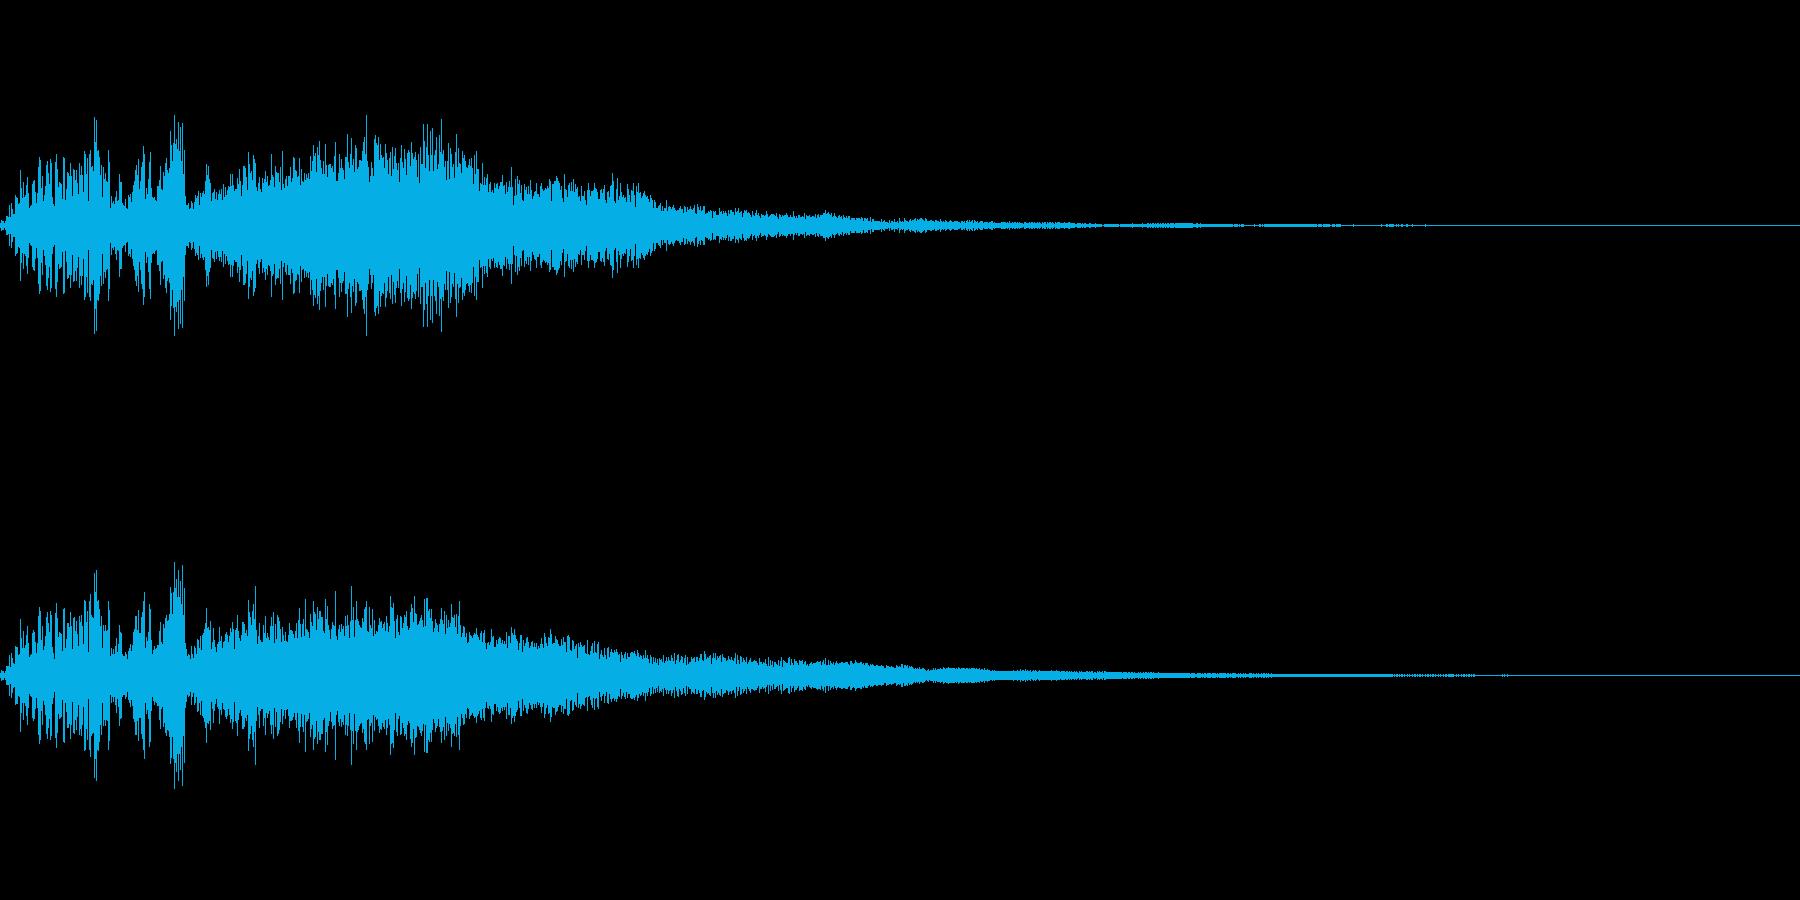 DJスクラッチとシンセの効果音「フワー」の再生済みの波形